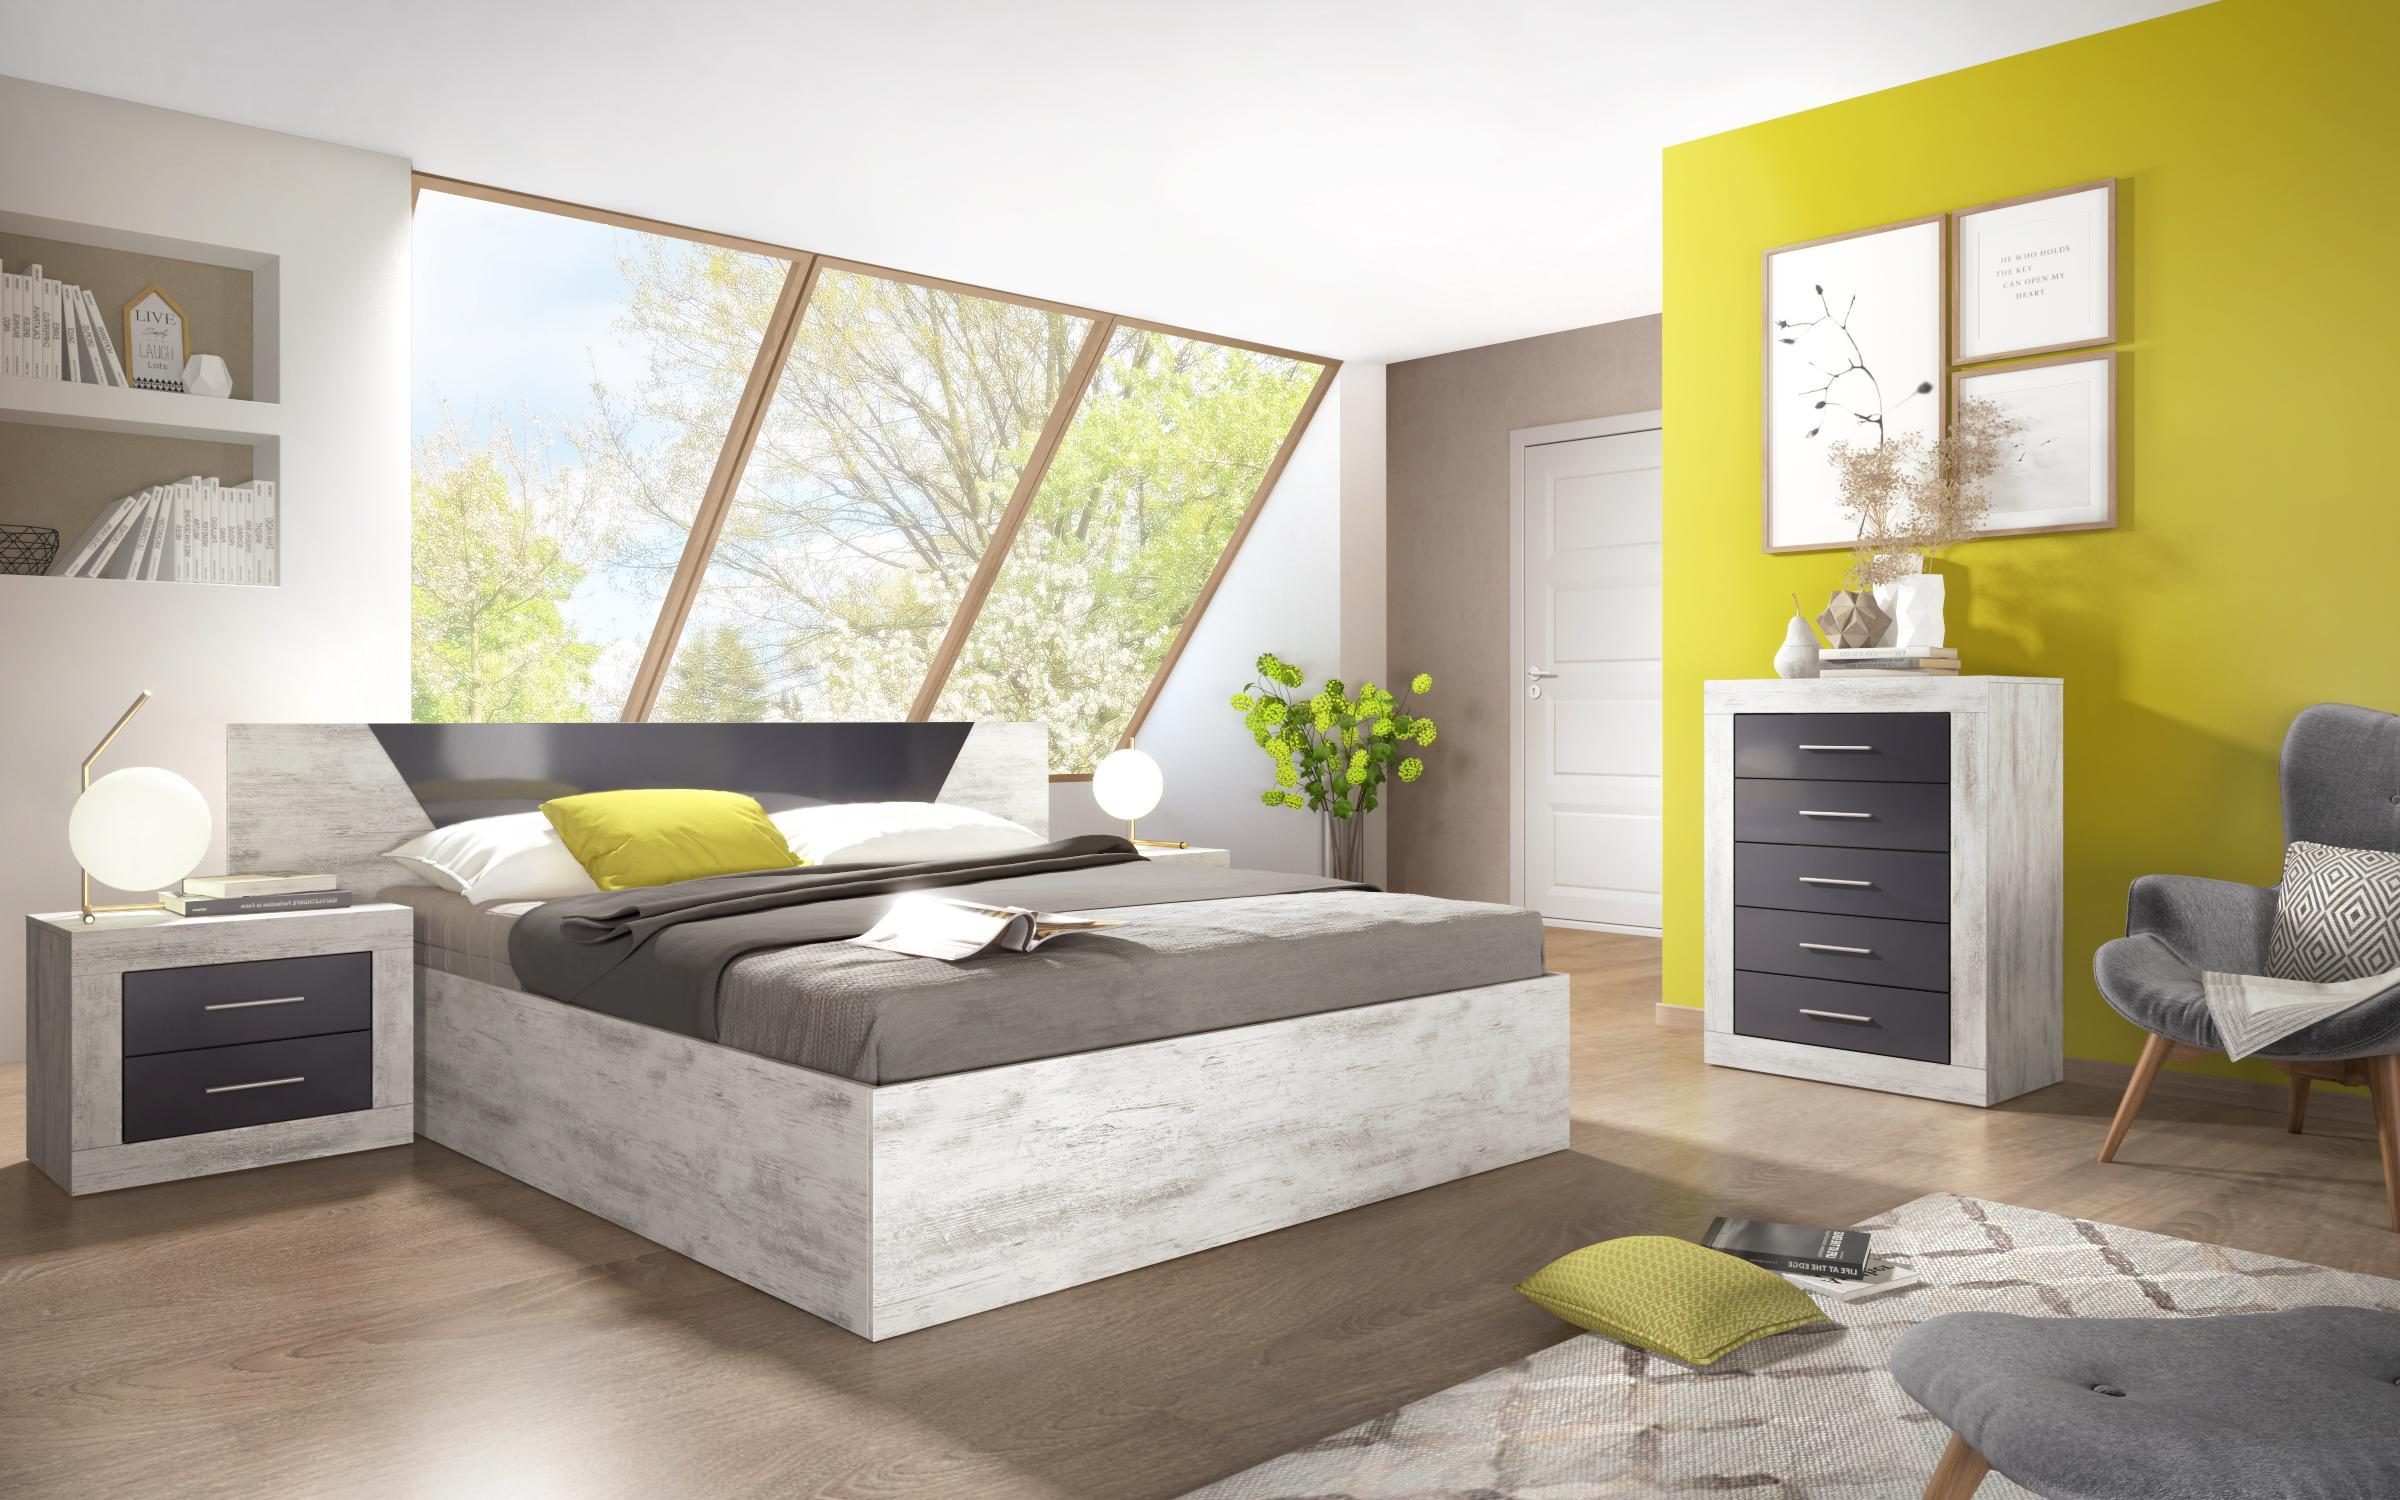 Спален комплект Канария, дъб антик + антрацит гланц